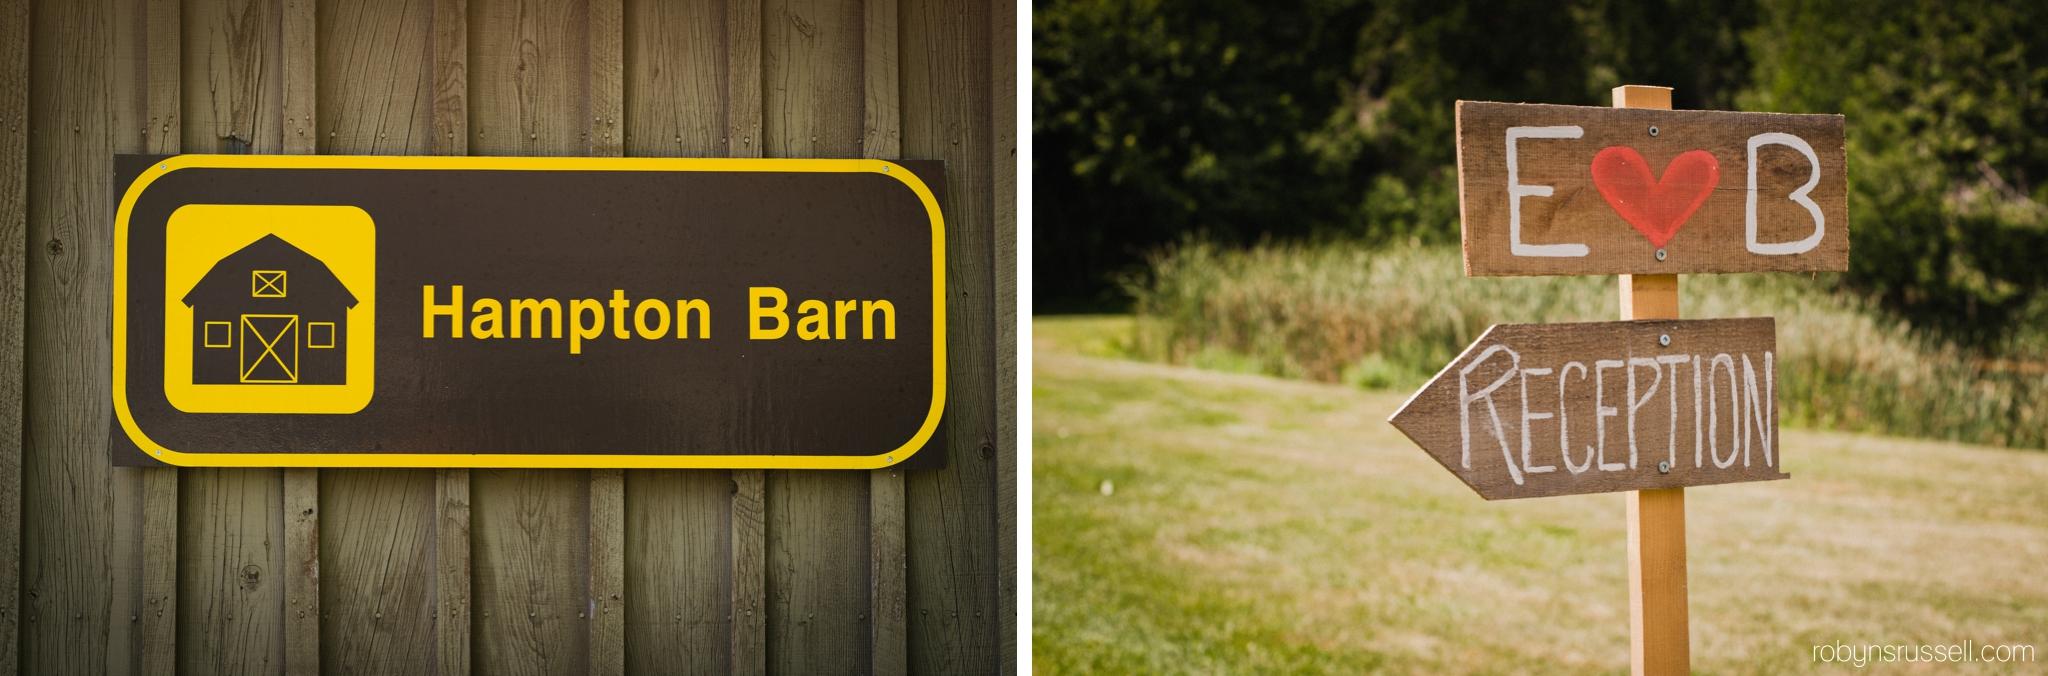 45-hampton-barn-reception-for-wedding.jpg